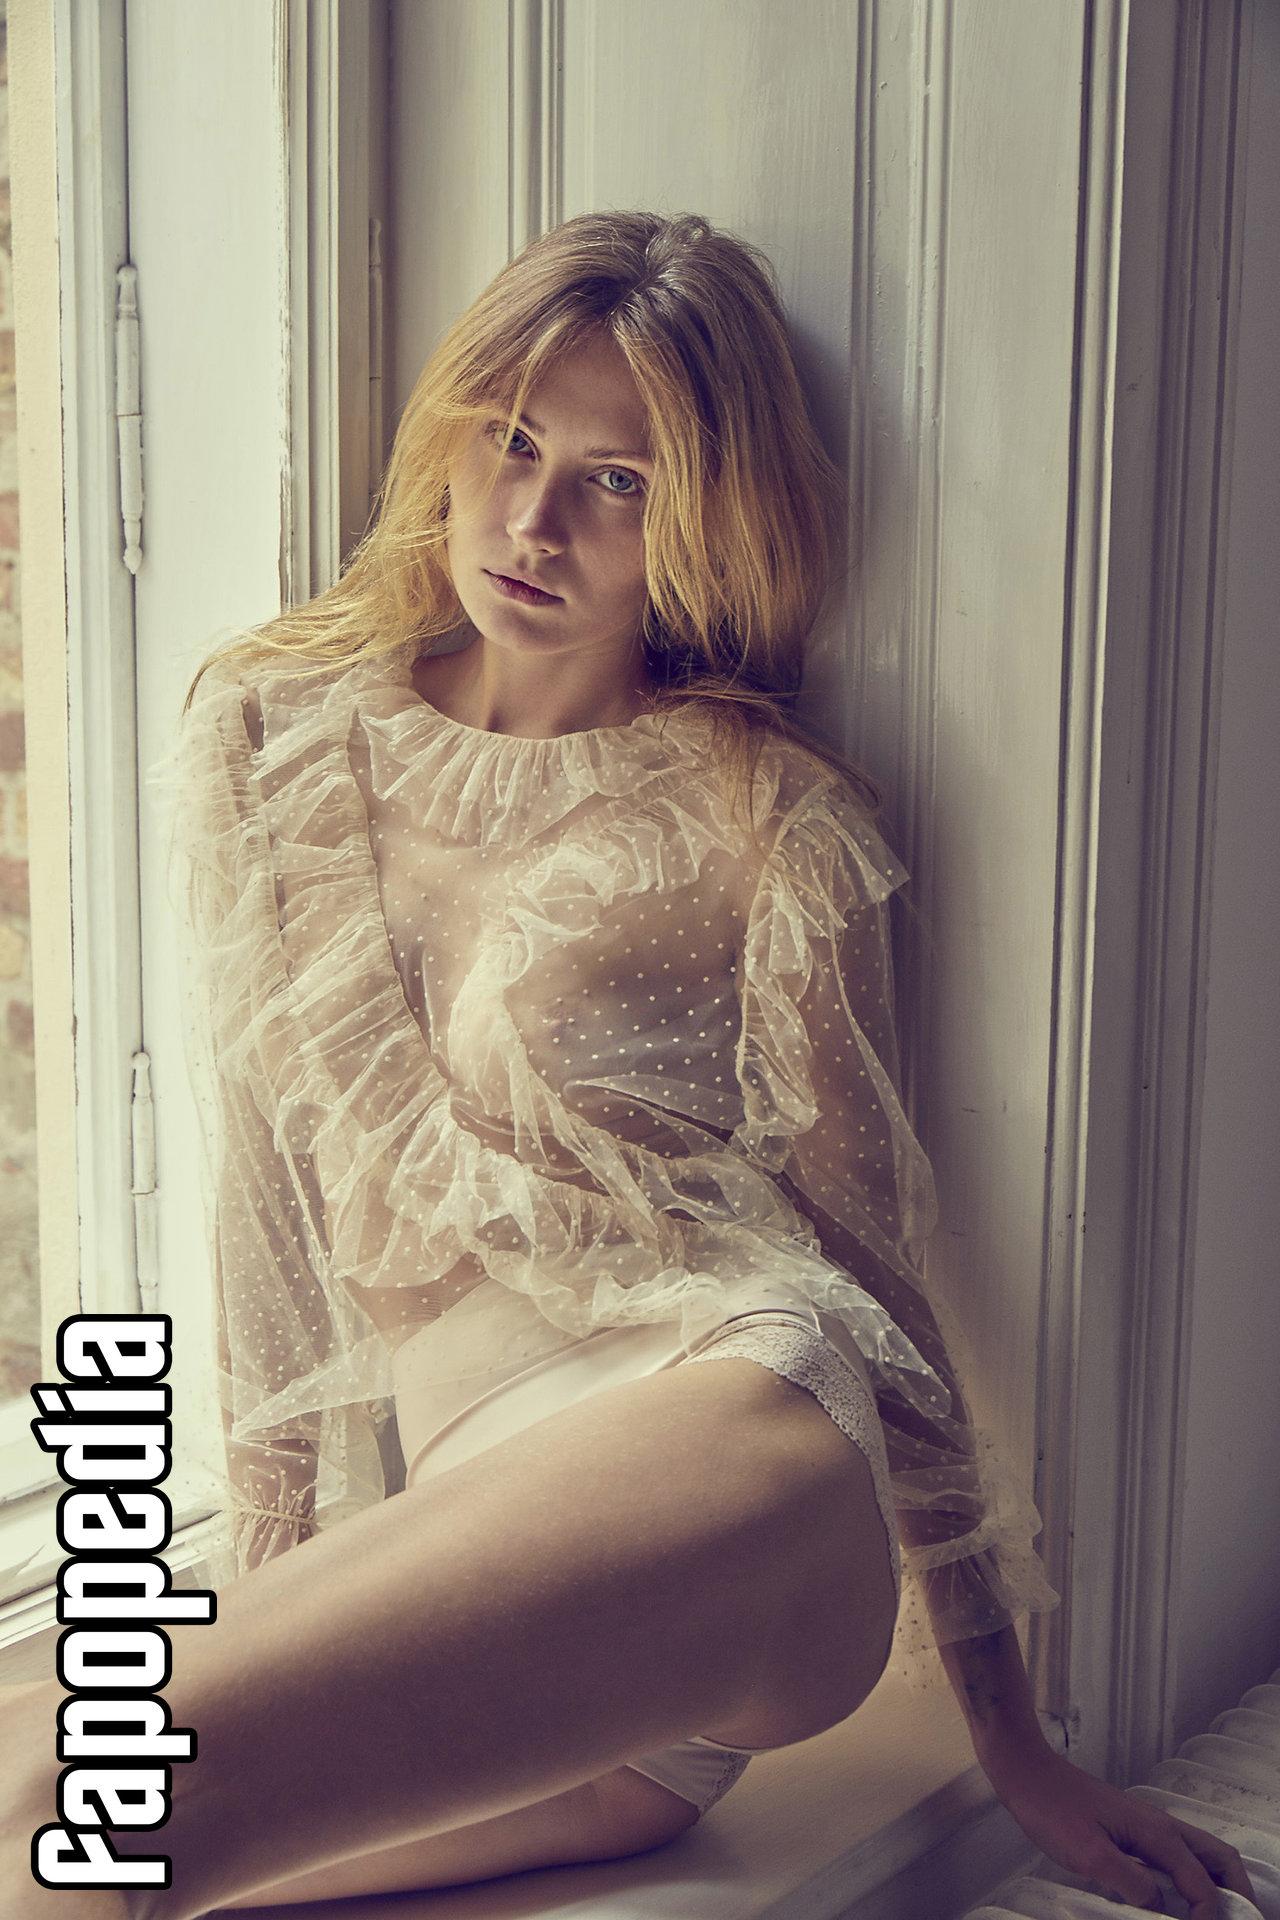 Kate D Nude Leaks